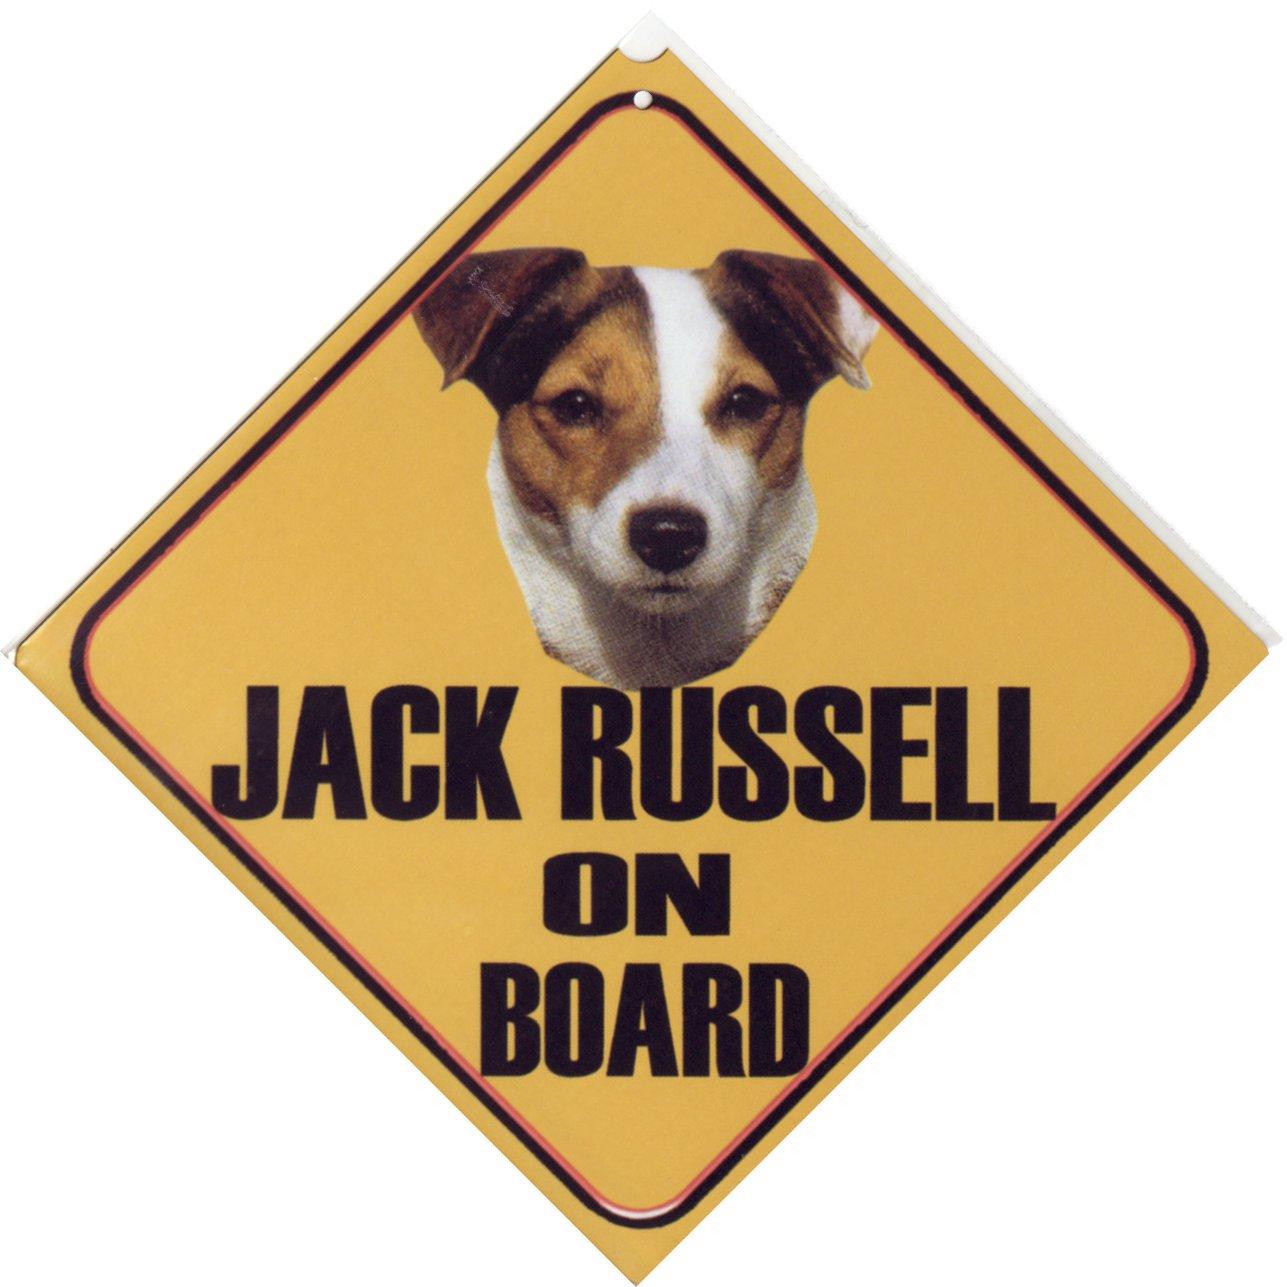 Jack russel graphics